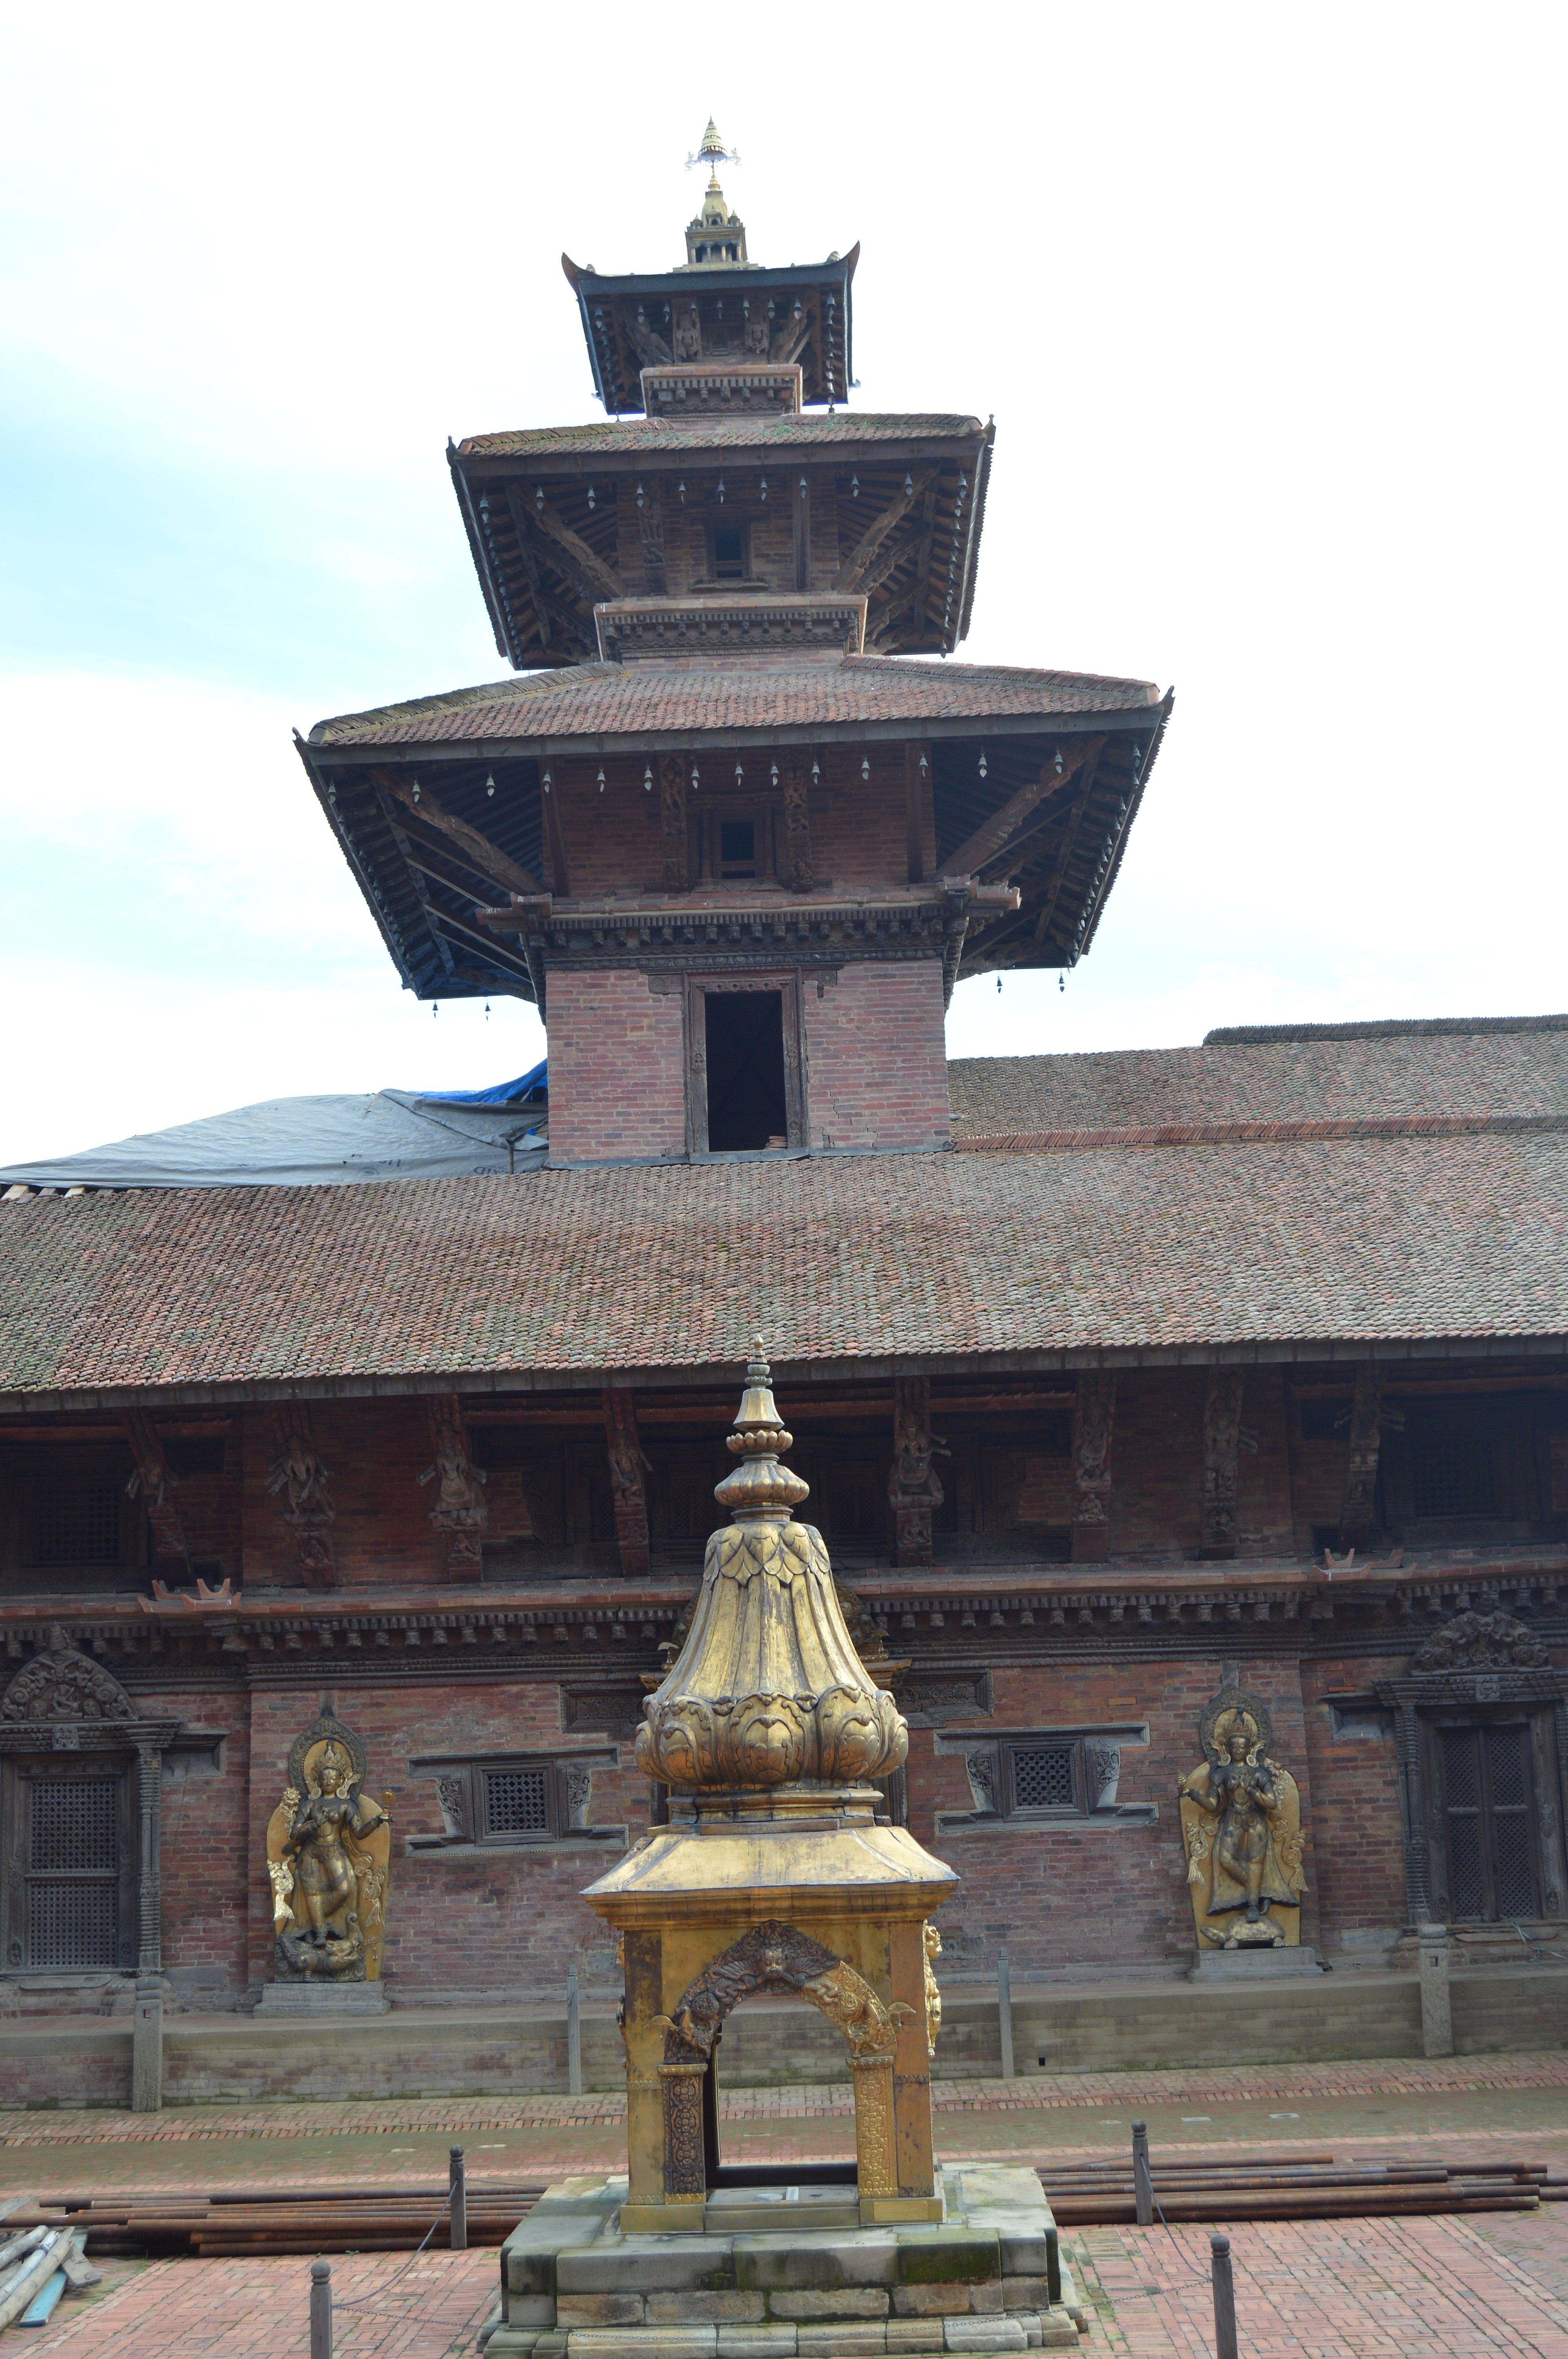 File:Mul Chowk, Patan Durbar Square 04 jpg - Wikimedia Commons